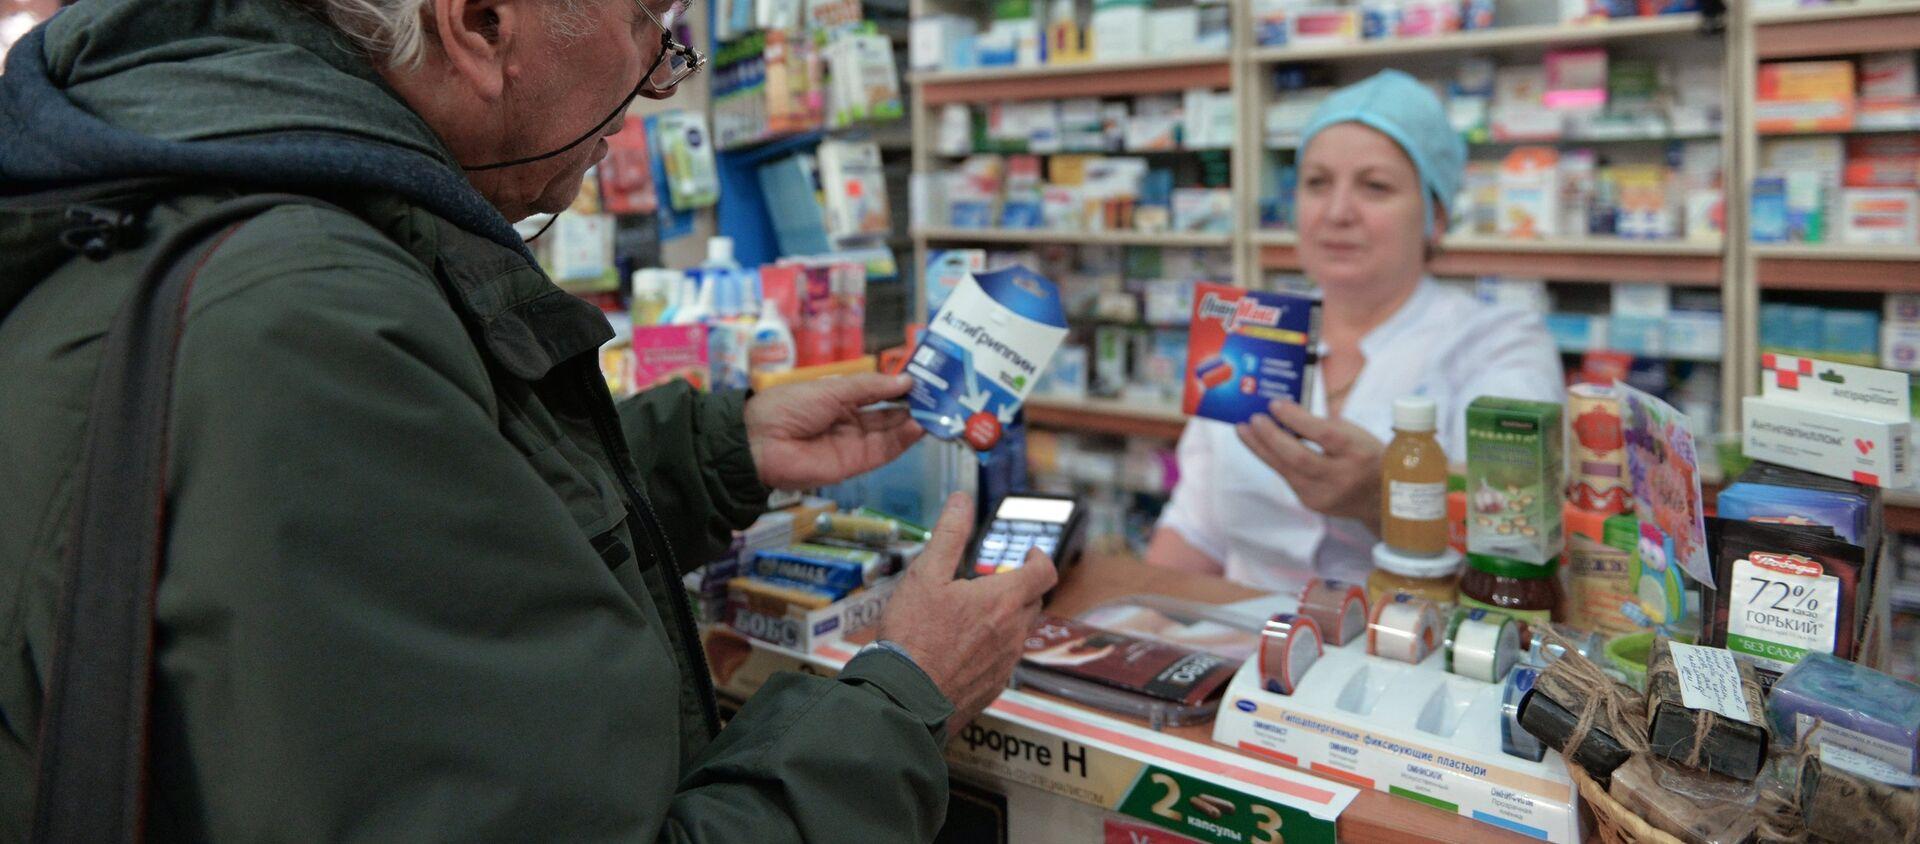 Продажа лекарств в аптеке - Sputnik Узбекистан, 1920, 07.09.2019